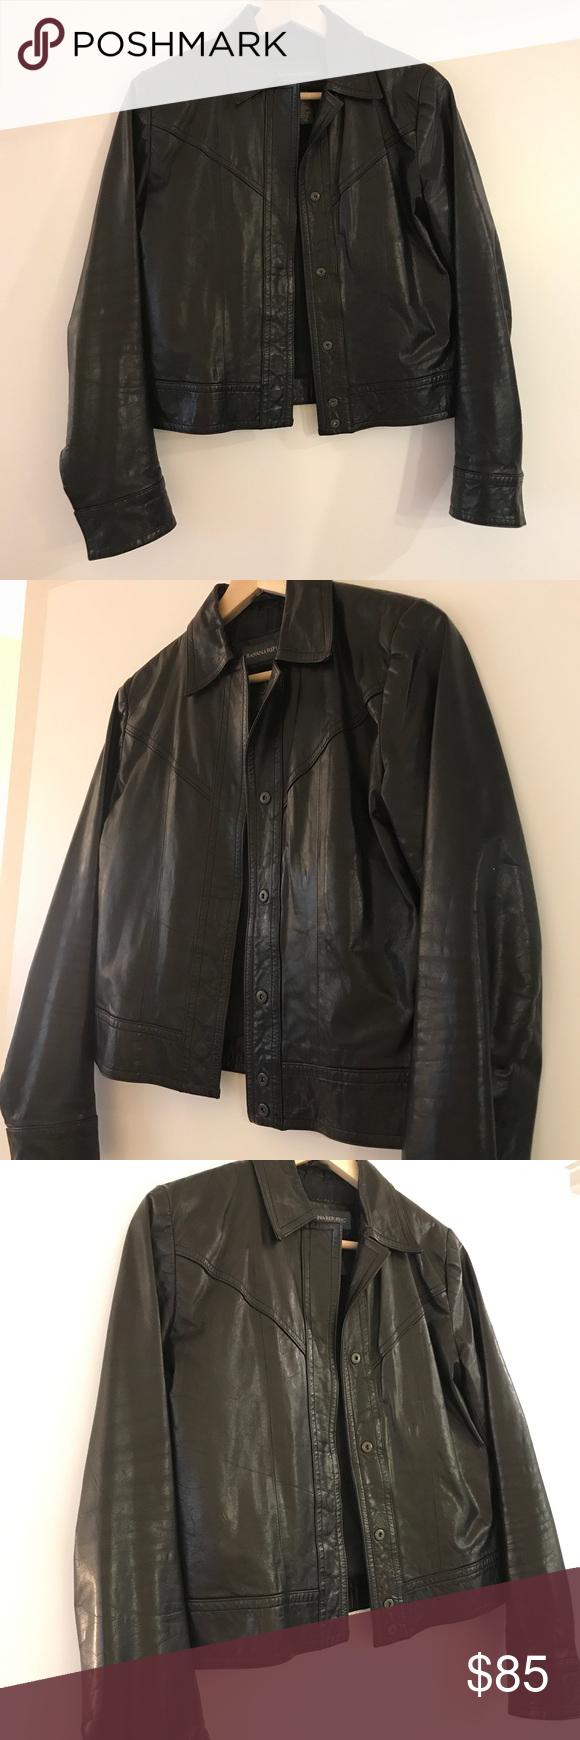 Banana Republic Leather Moto Jacket Women's XS Jackets